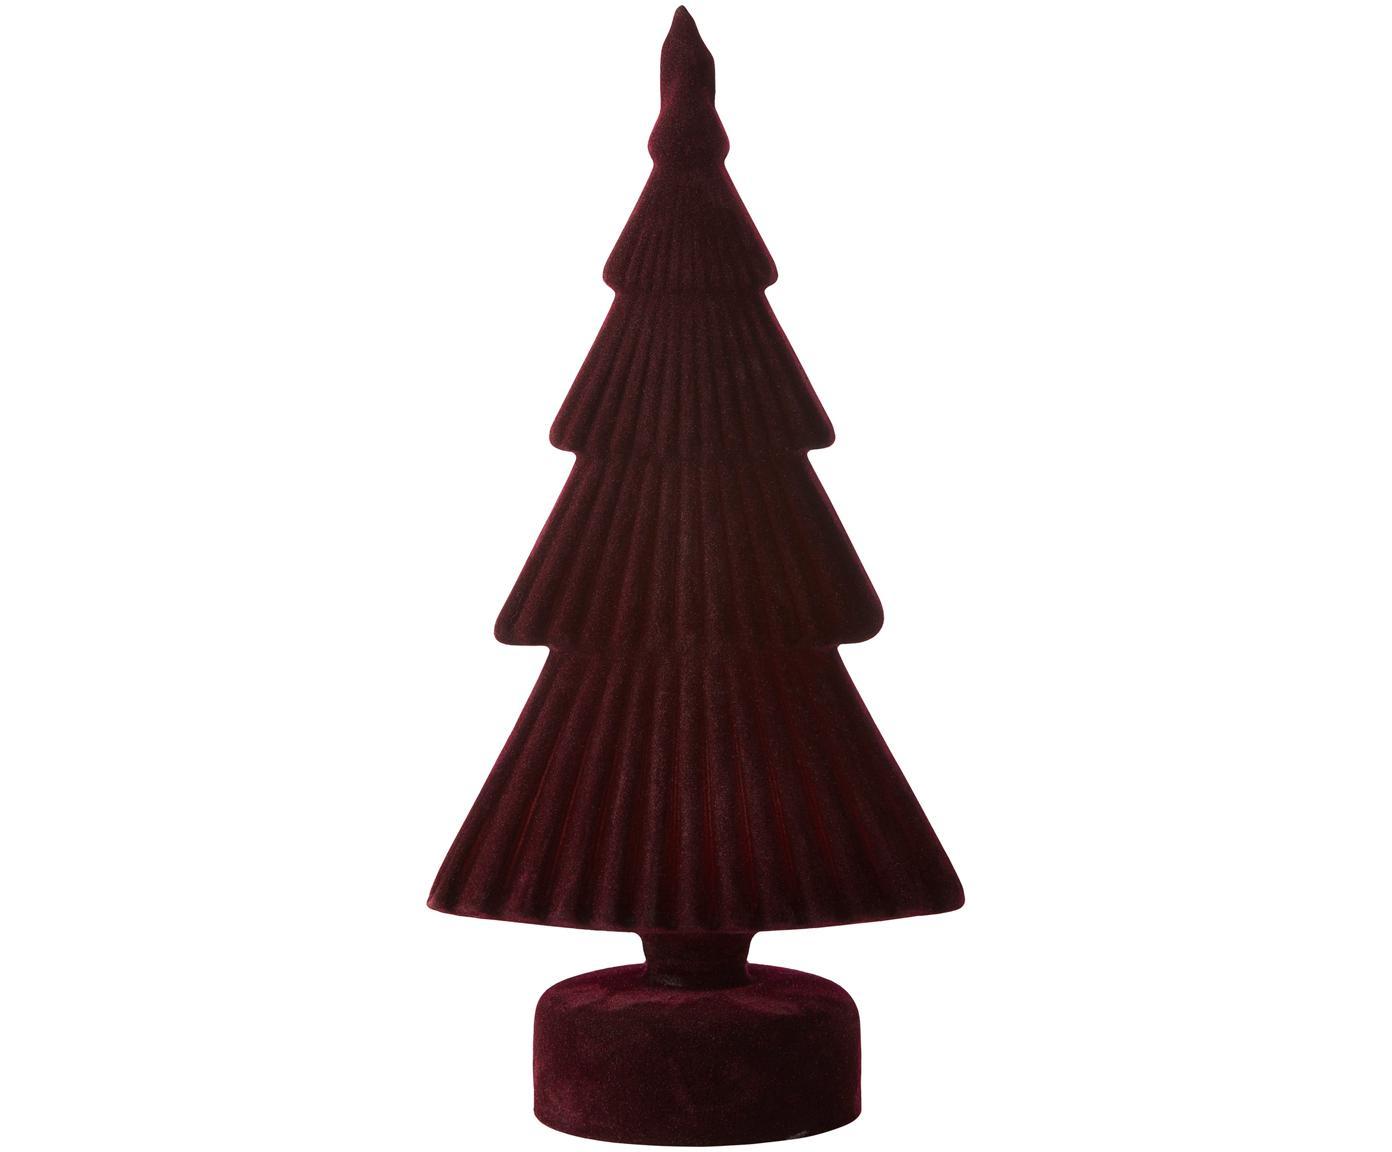 Pieza decorativa Velvie Christmas Tree, Figura: vidrio, Exterior: poliéster, Rojo oscuro, An 13 x Al 27 cm